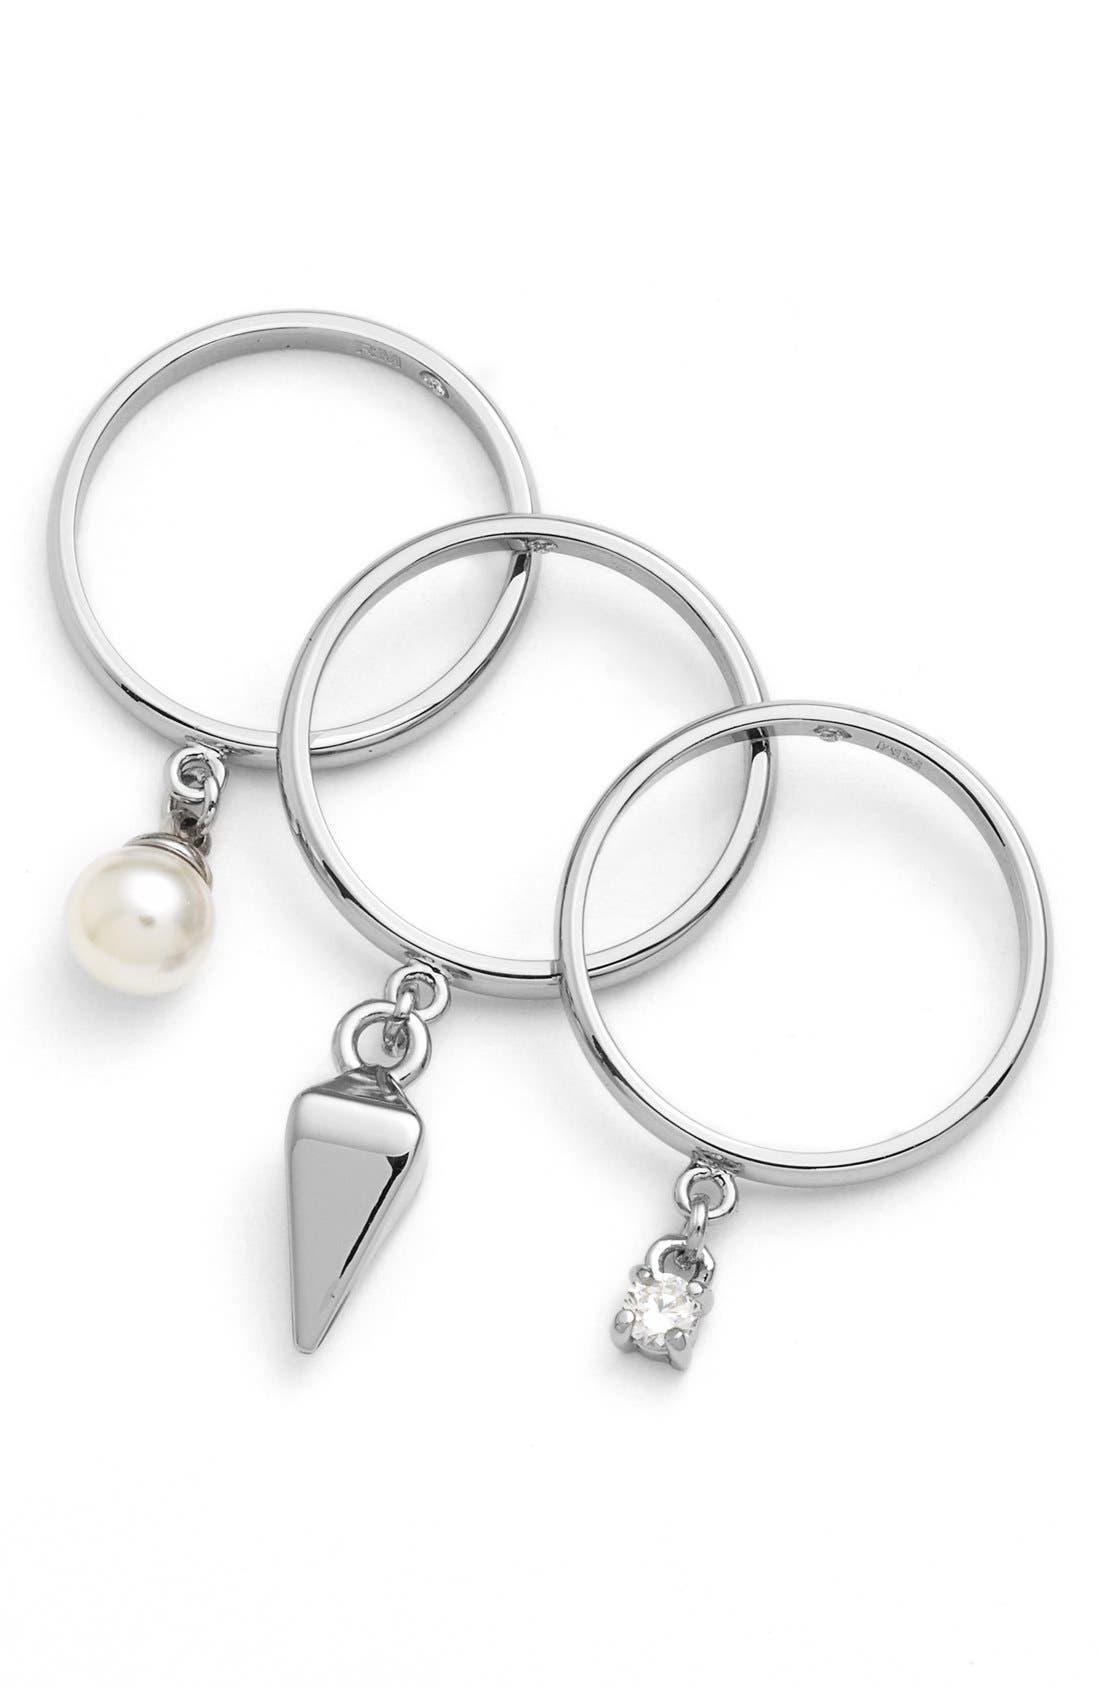 Alternate Image 2  - Rebecca Minkoff 'Jewel Box' Stackable Charm Rings (Set of 3)